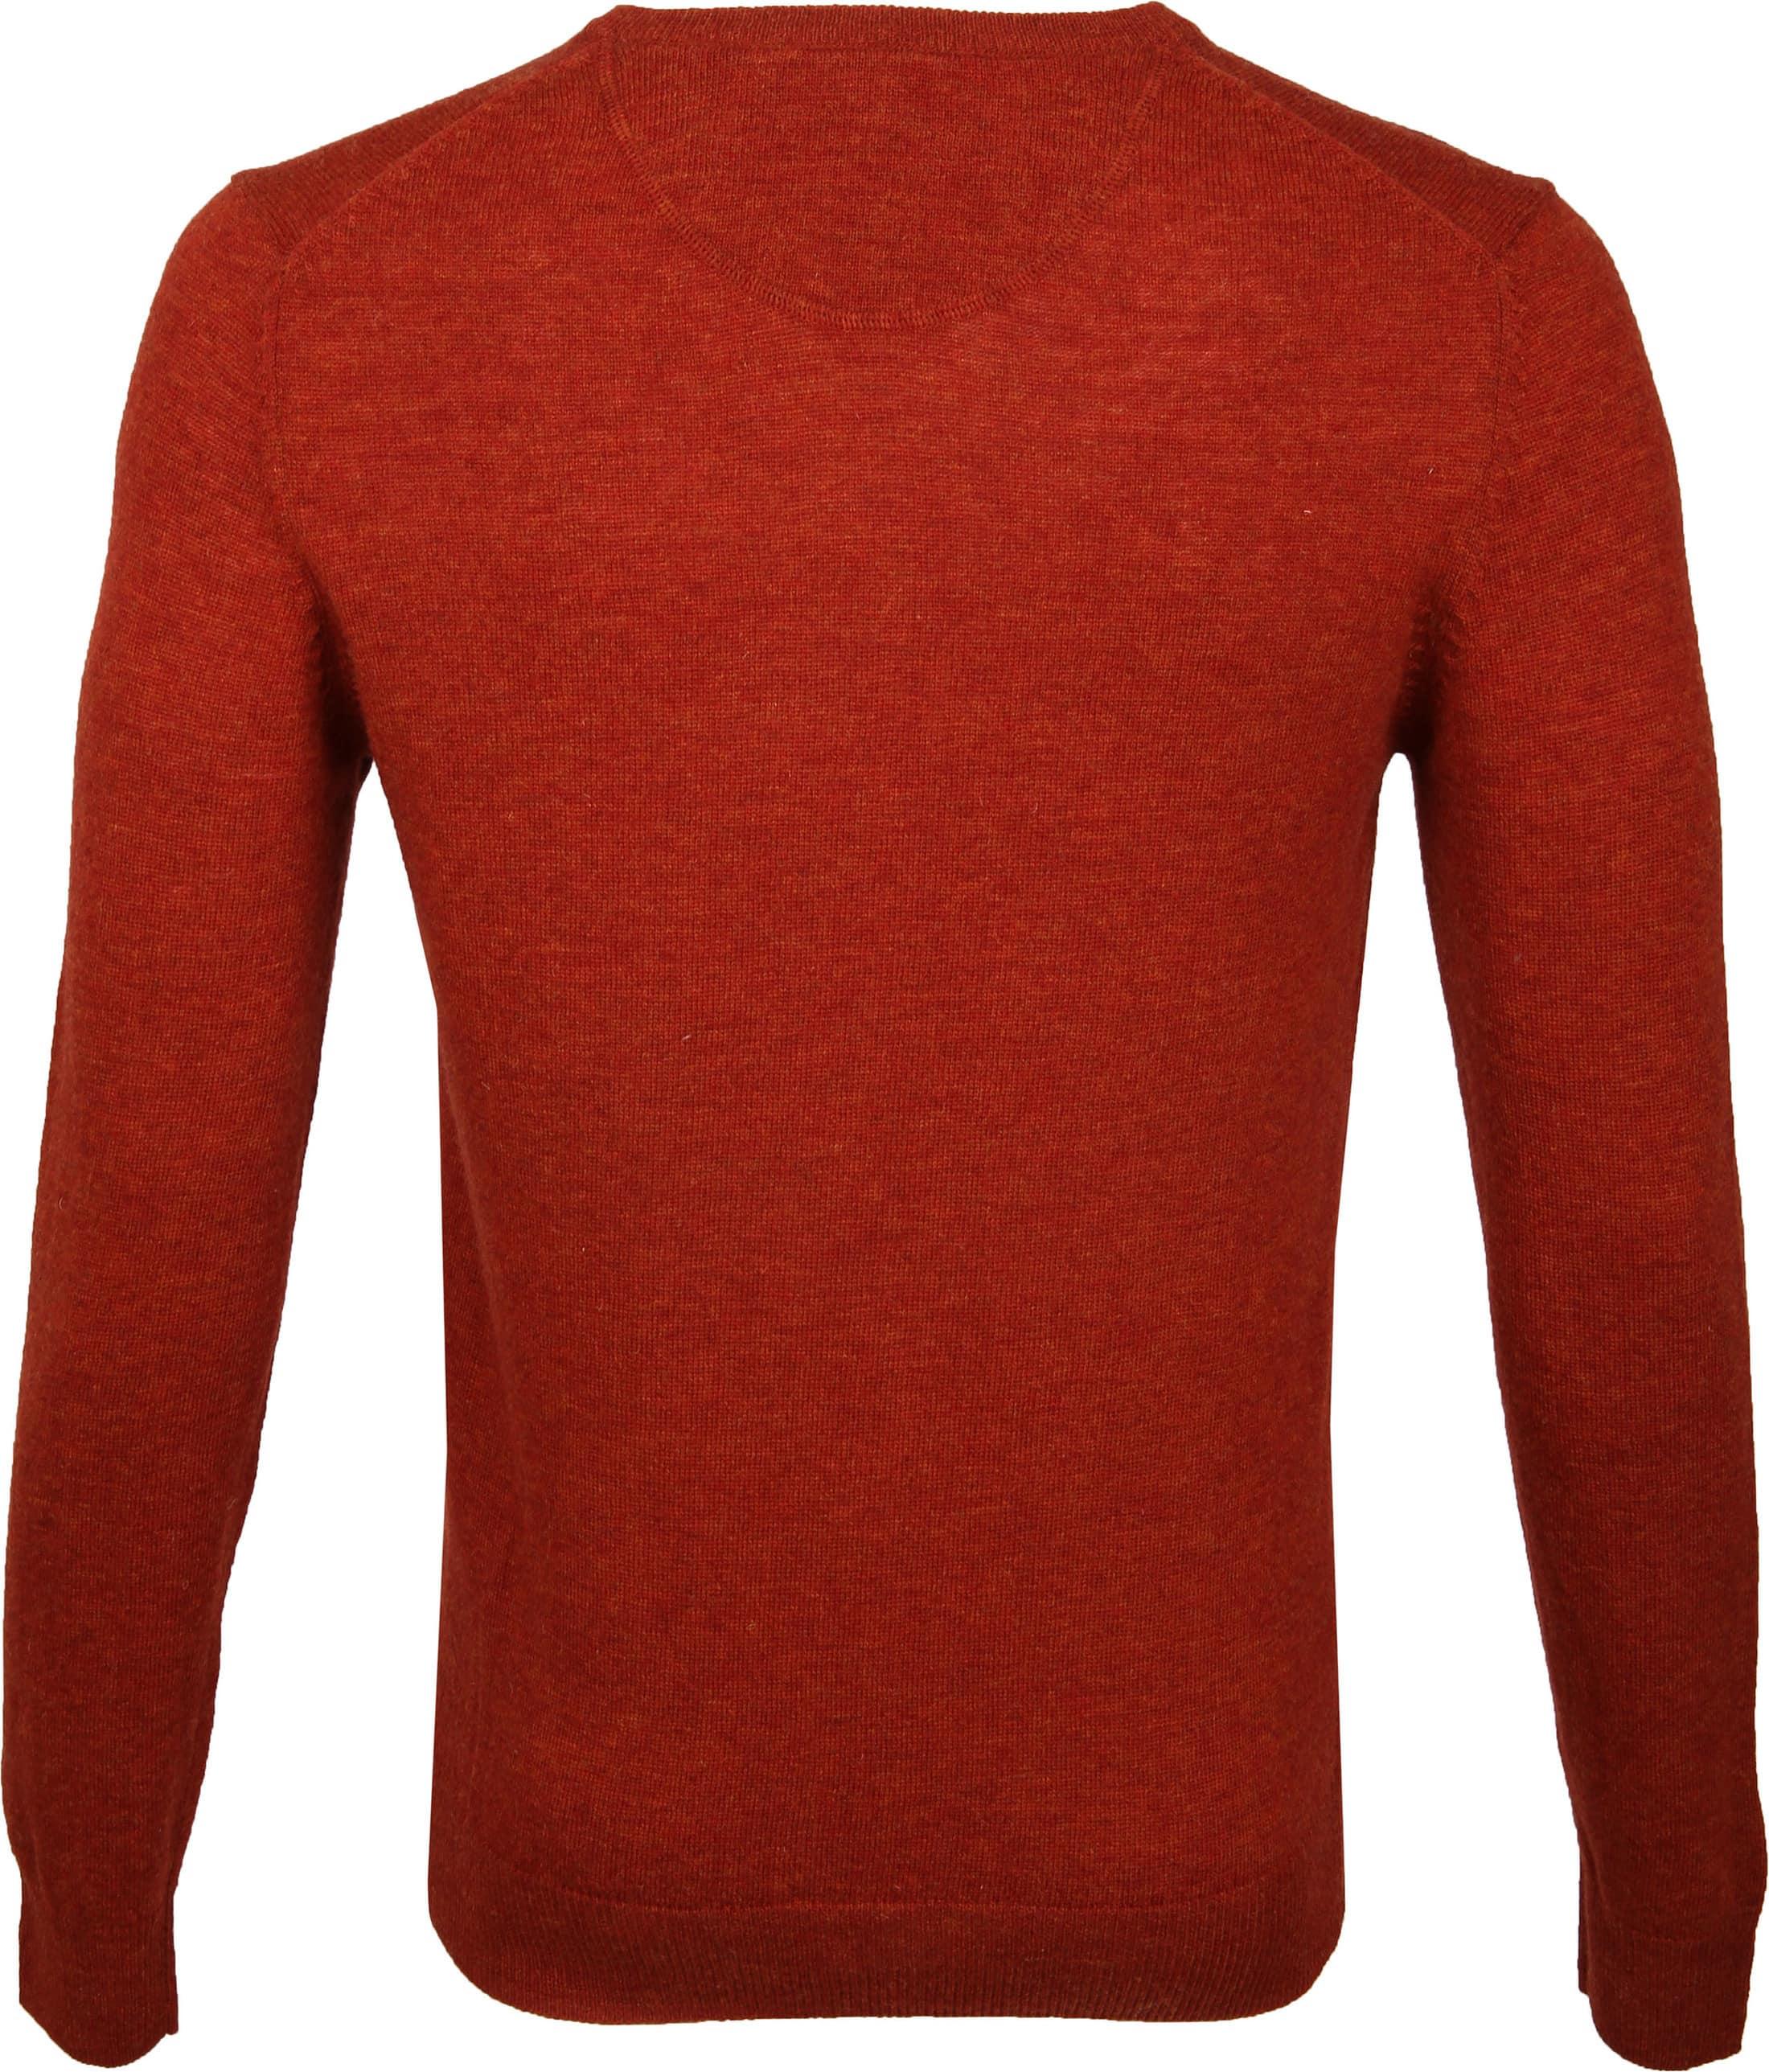 Suitable Pullover V-Neck Lambswool Orange foto 4